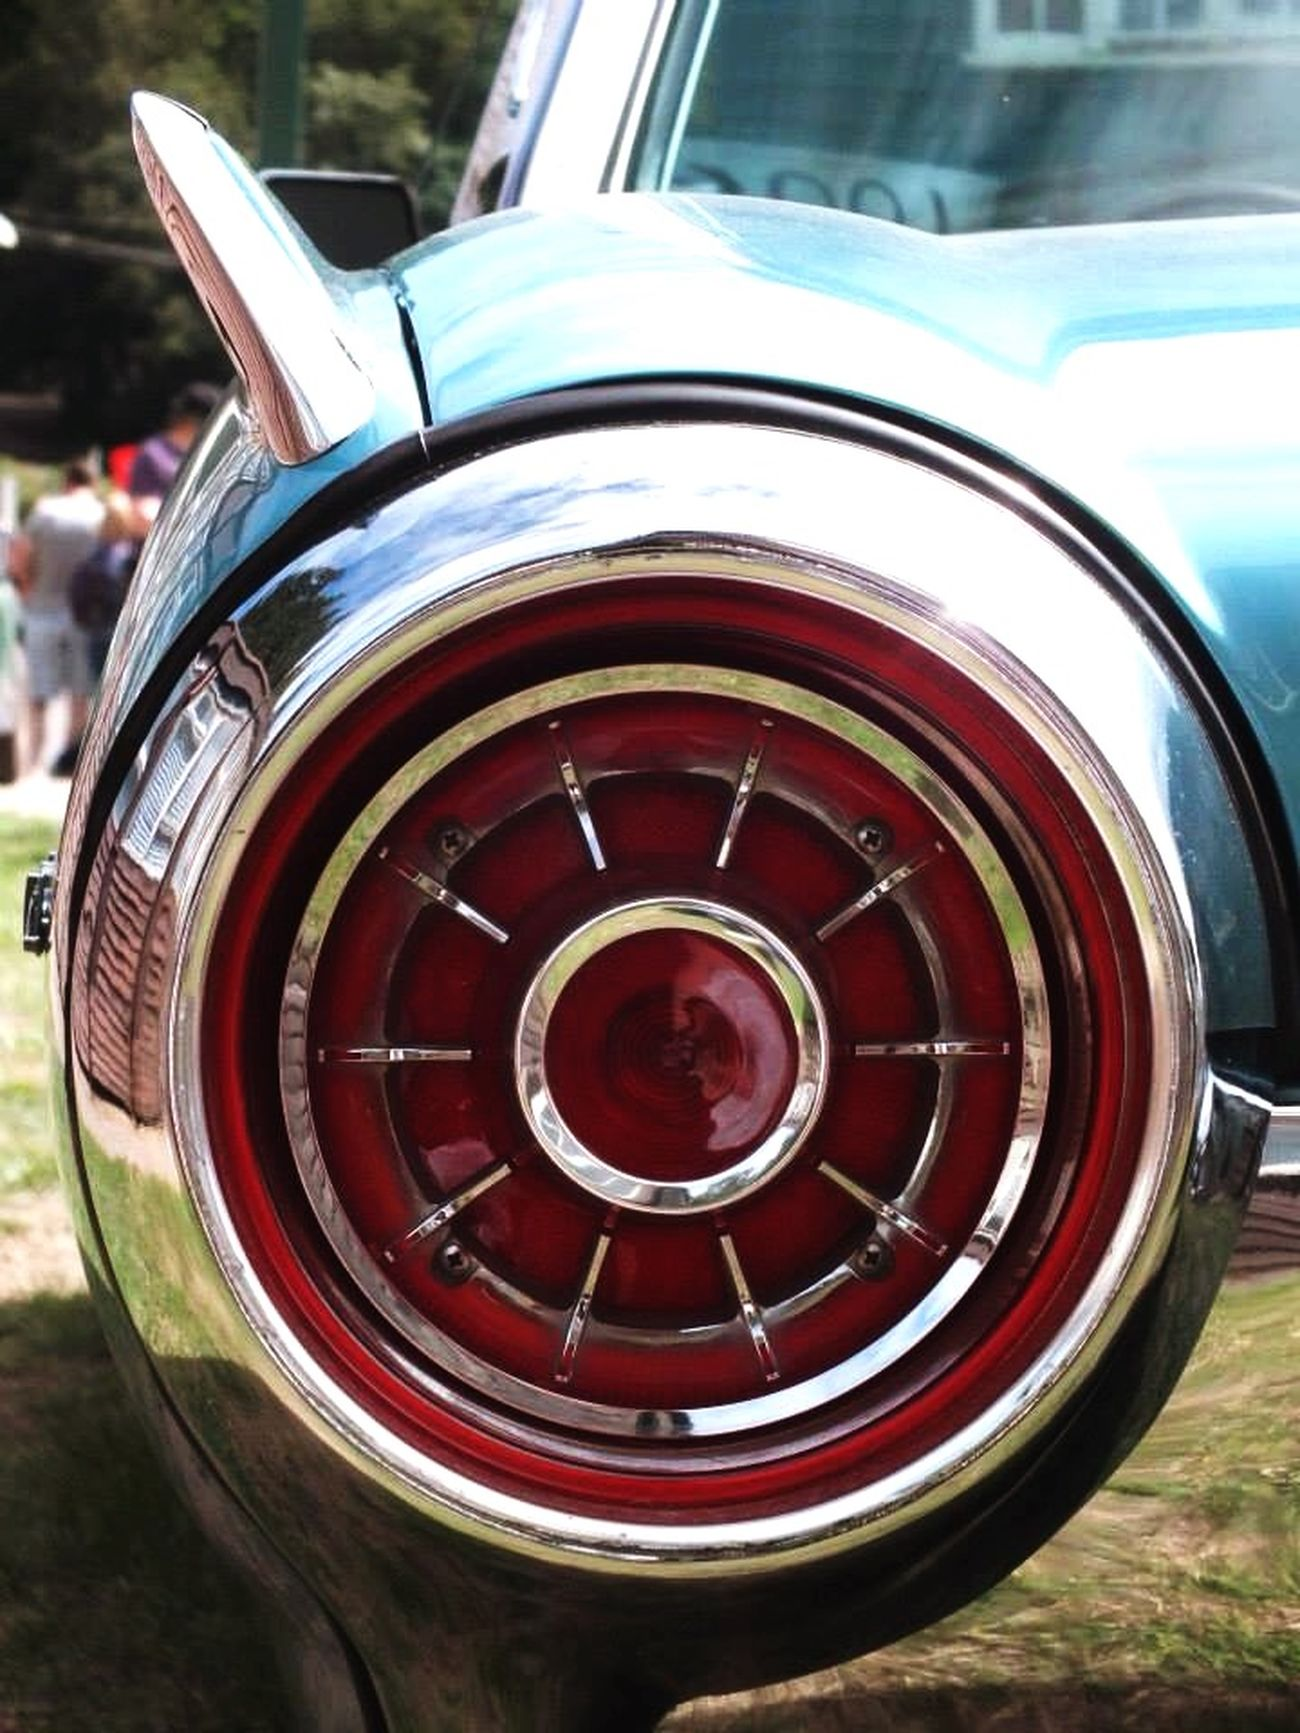 Thunderbird Thunderbird Classic Car American Cars Car Lights Brooklandsmuseum